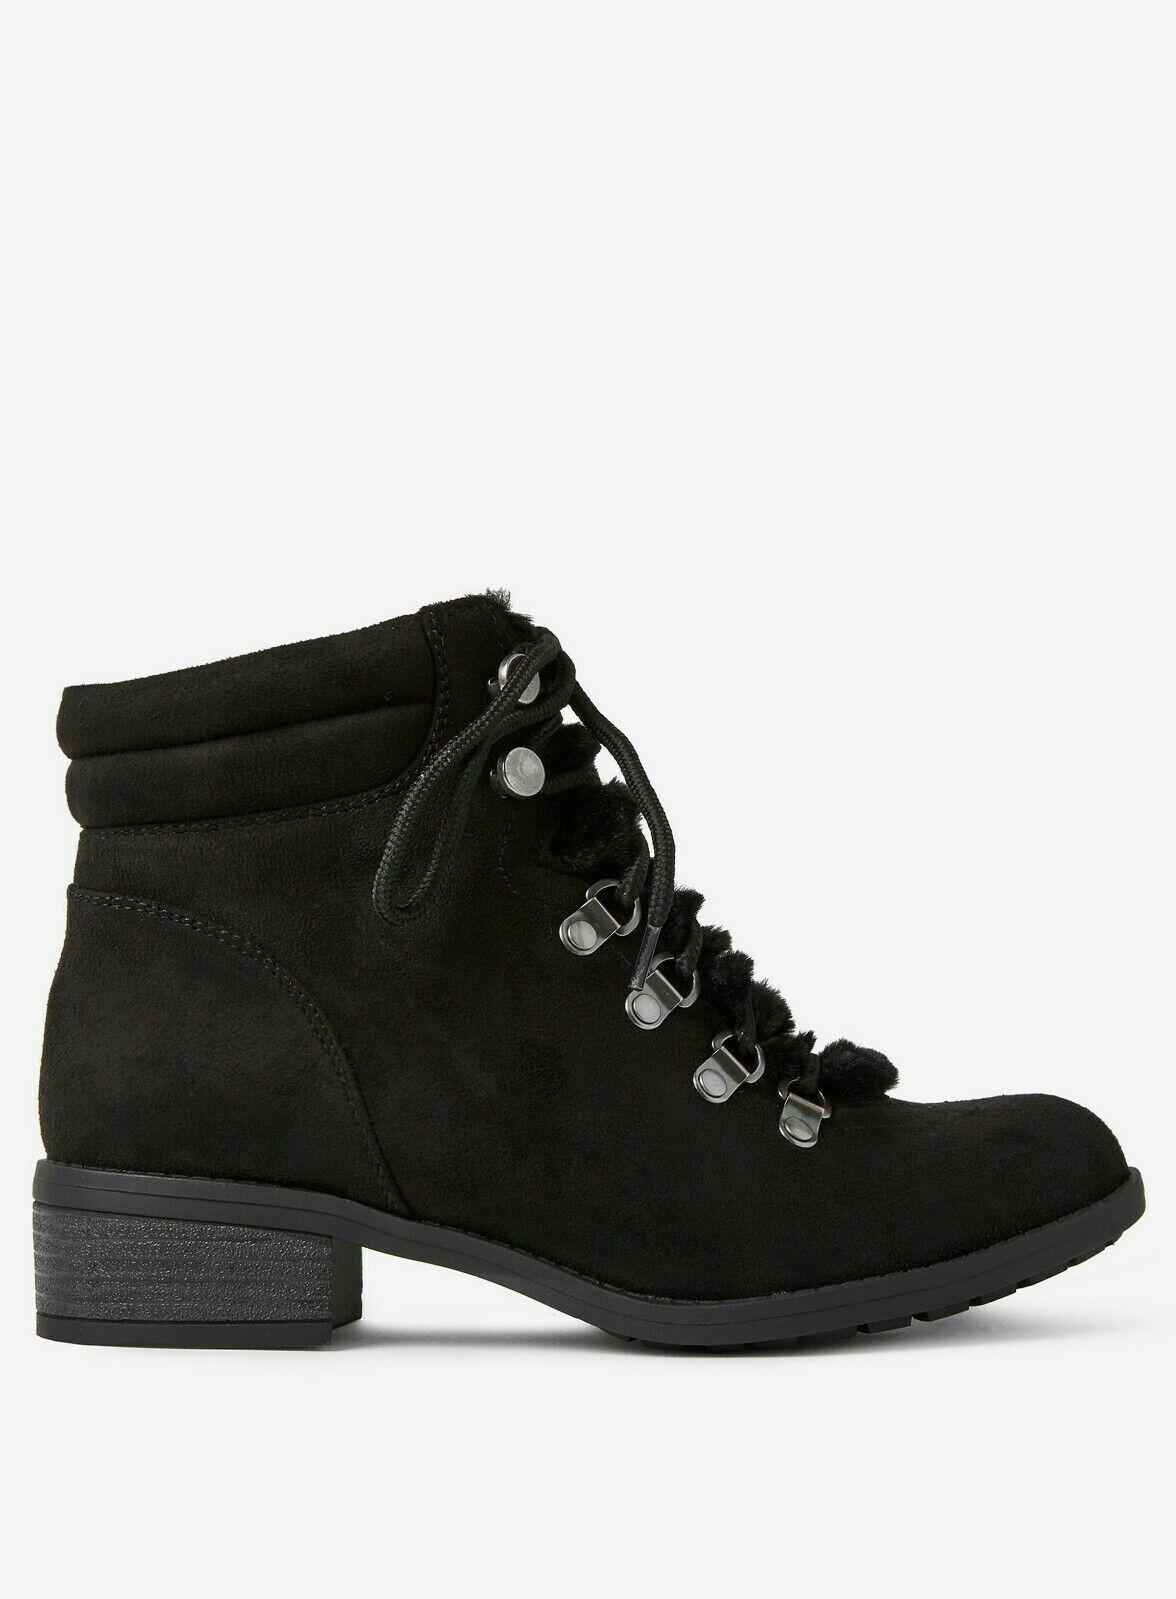 T1 73 Dgoldthy Perkins Wide Fit Black 'Abbie' Lace Up Ankle Boots Women's UK 7